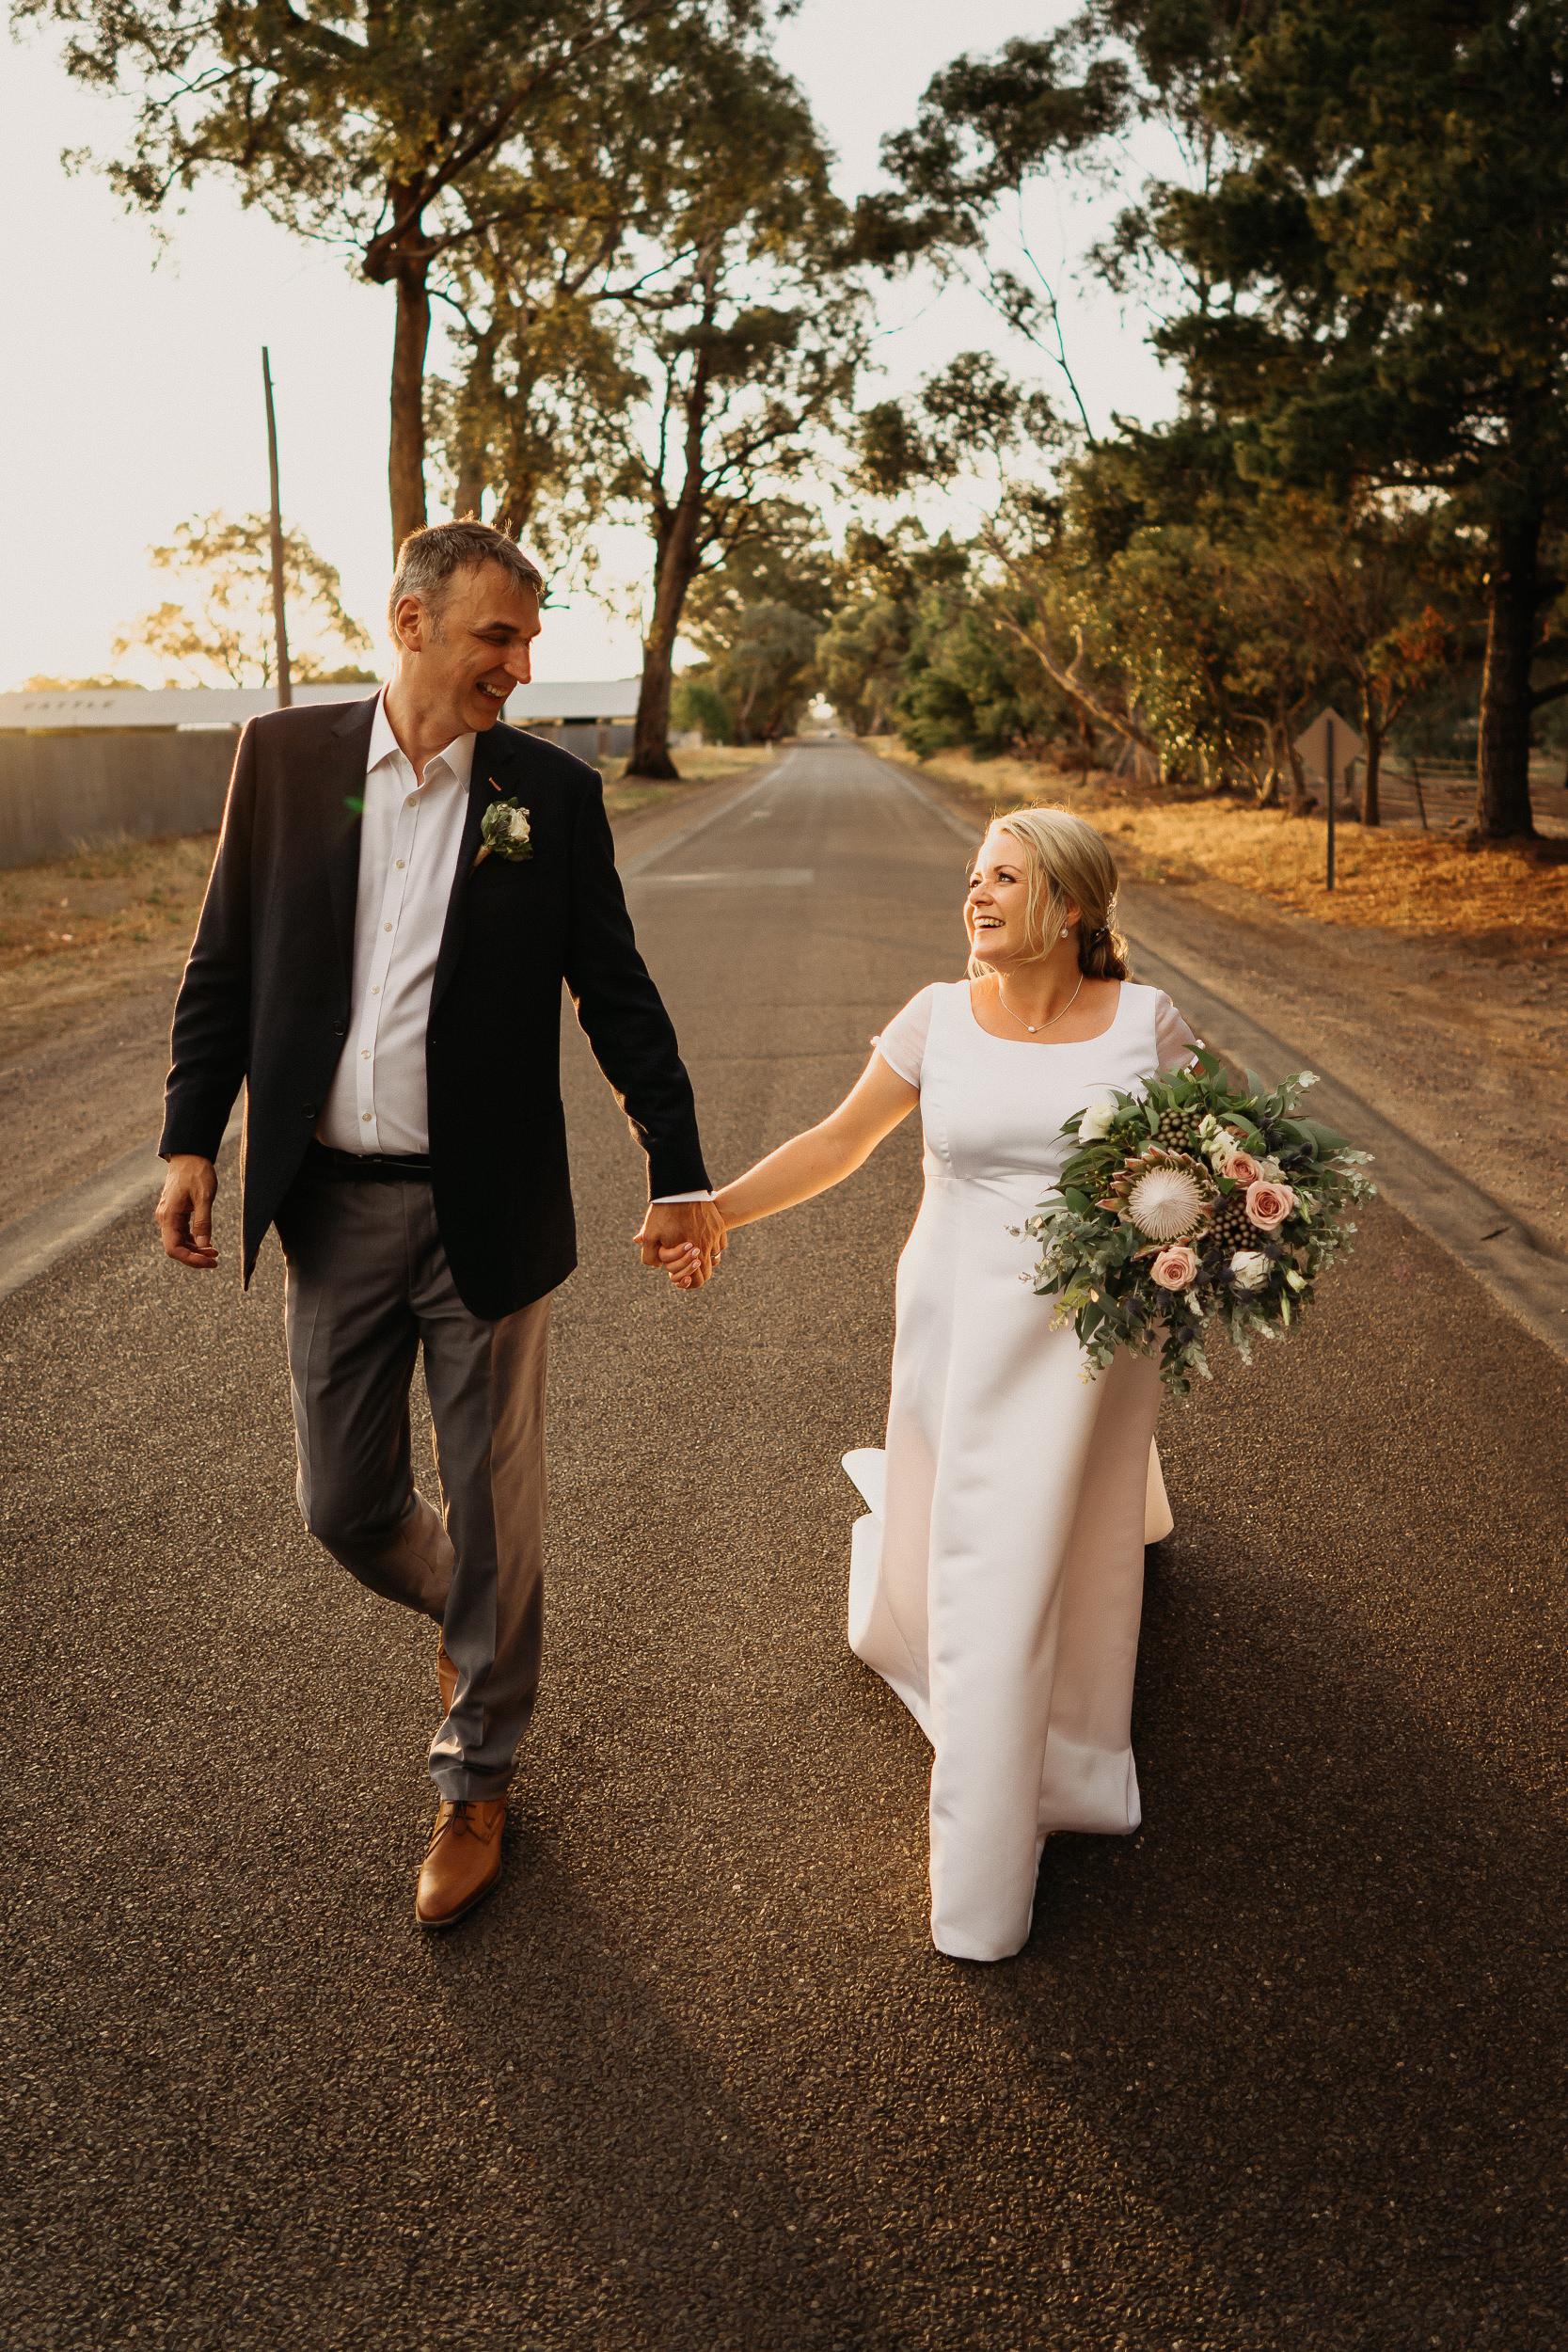 Melbourne-Wedding-Photographer-1005.jpg